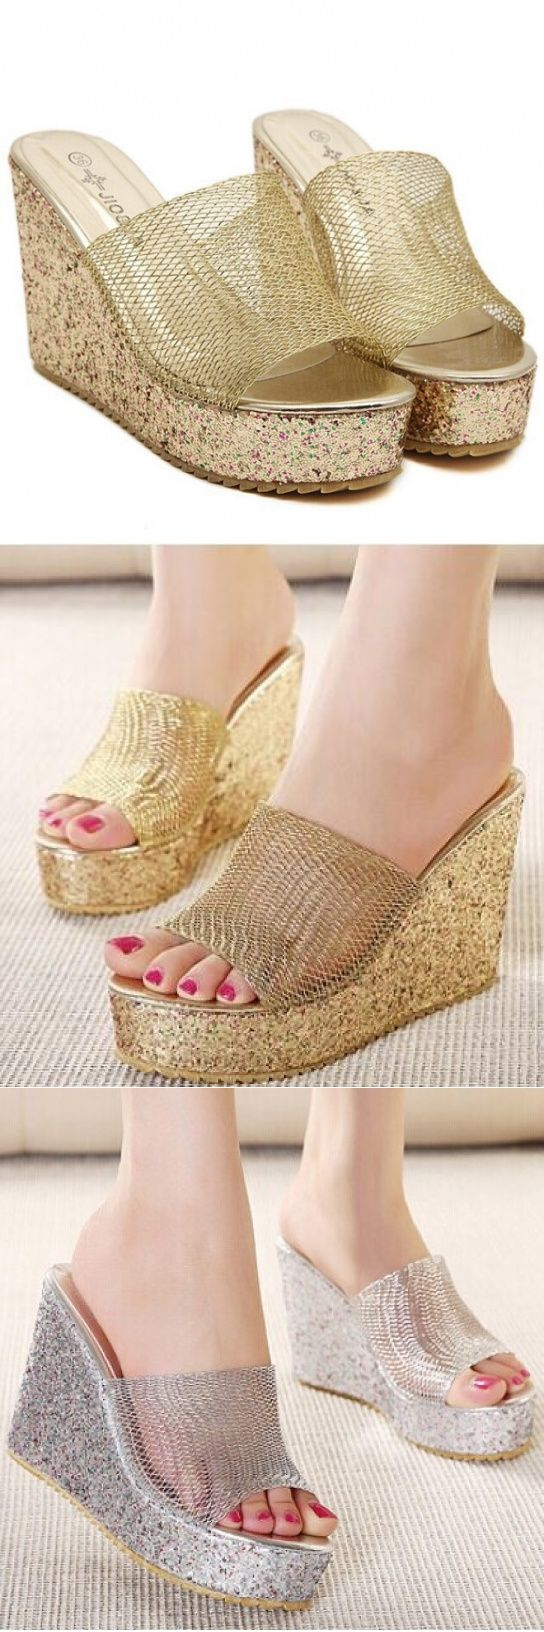 Sandals honeymoon shoes with rhinestone - Chocolate Dark Shoes Weddings Stilettos Nude 3 Inch Girly Massaging Crocheted Darkish Sandals Resorts In